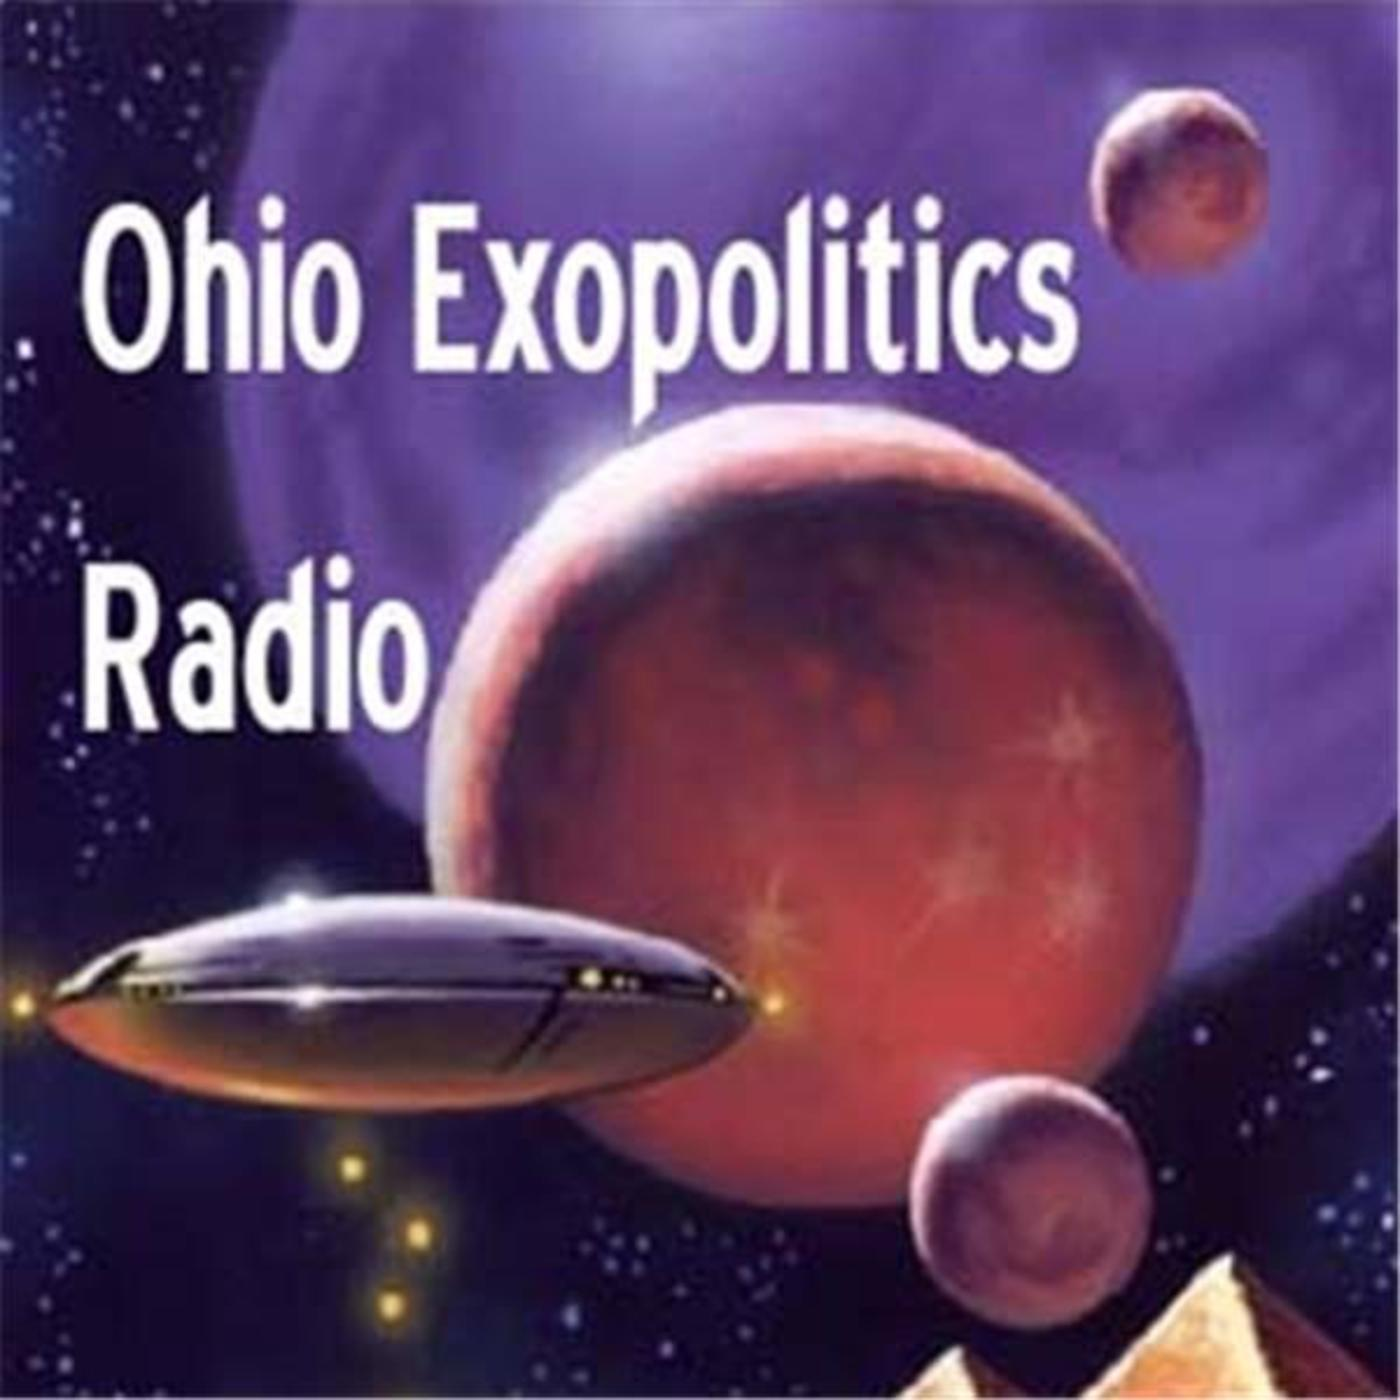 Ohio Exopolitics